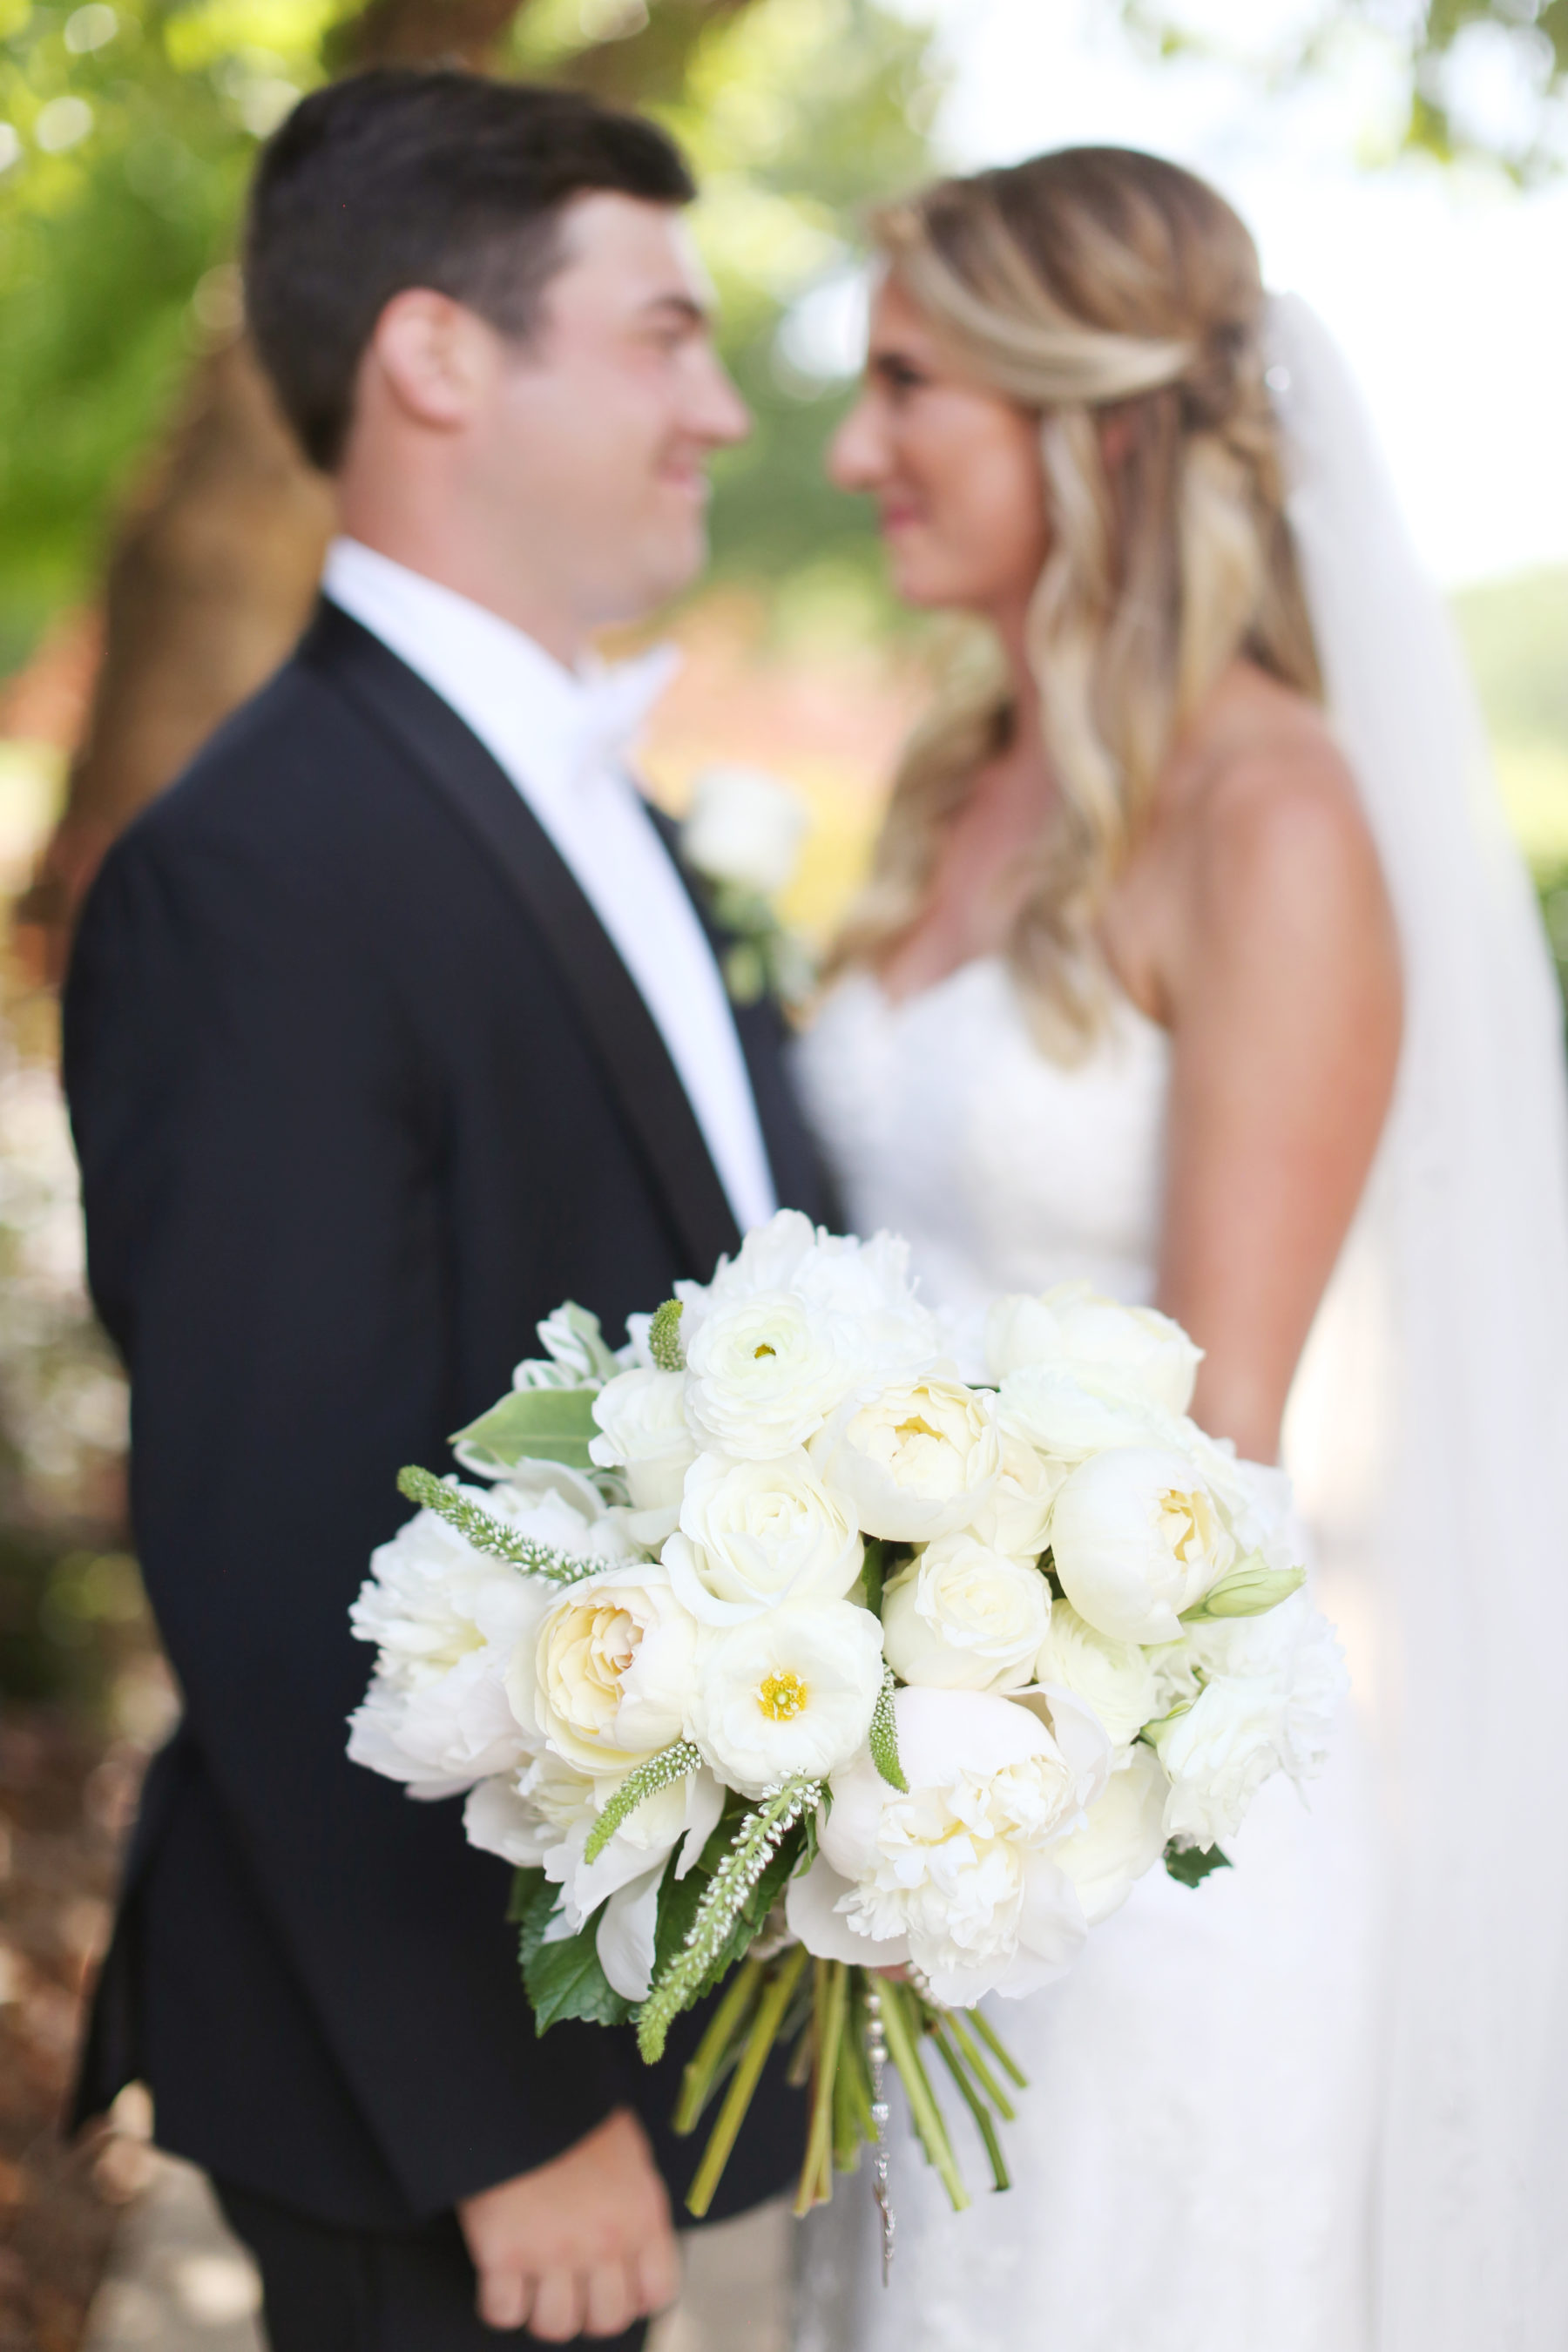 Emily Taylor Weddings Floral Design featured on Nashville Bride Guide